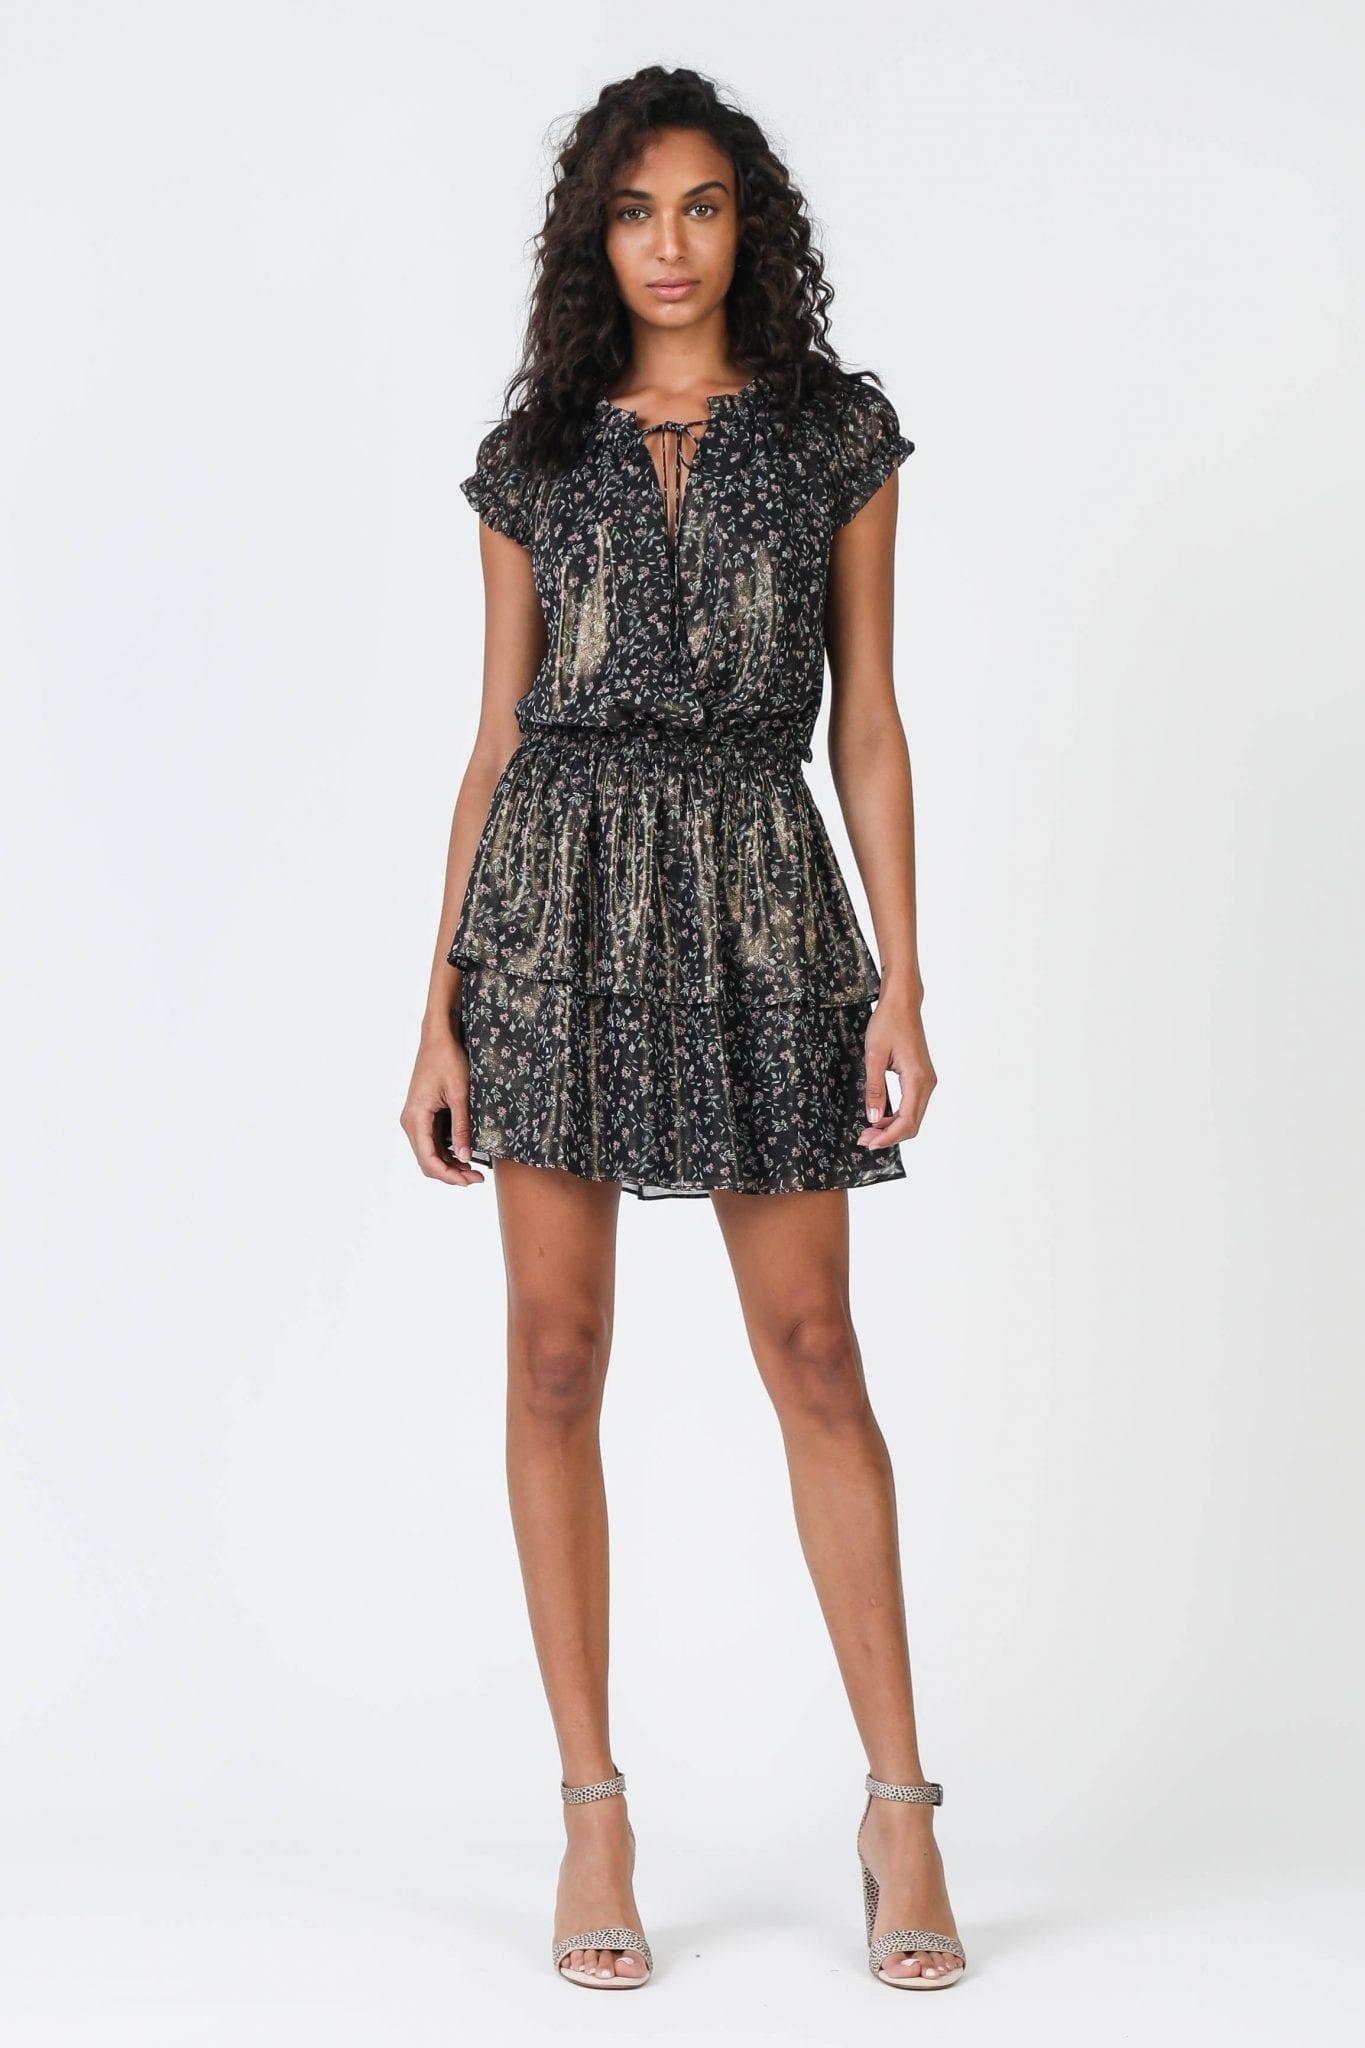 SHOPCURRENTAIR Metallic Ditsy Floral Mini Dress